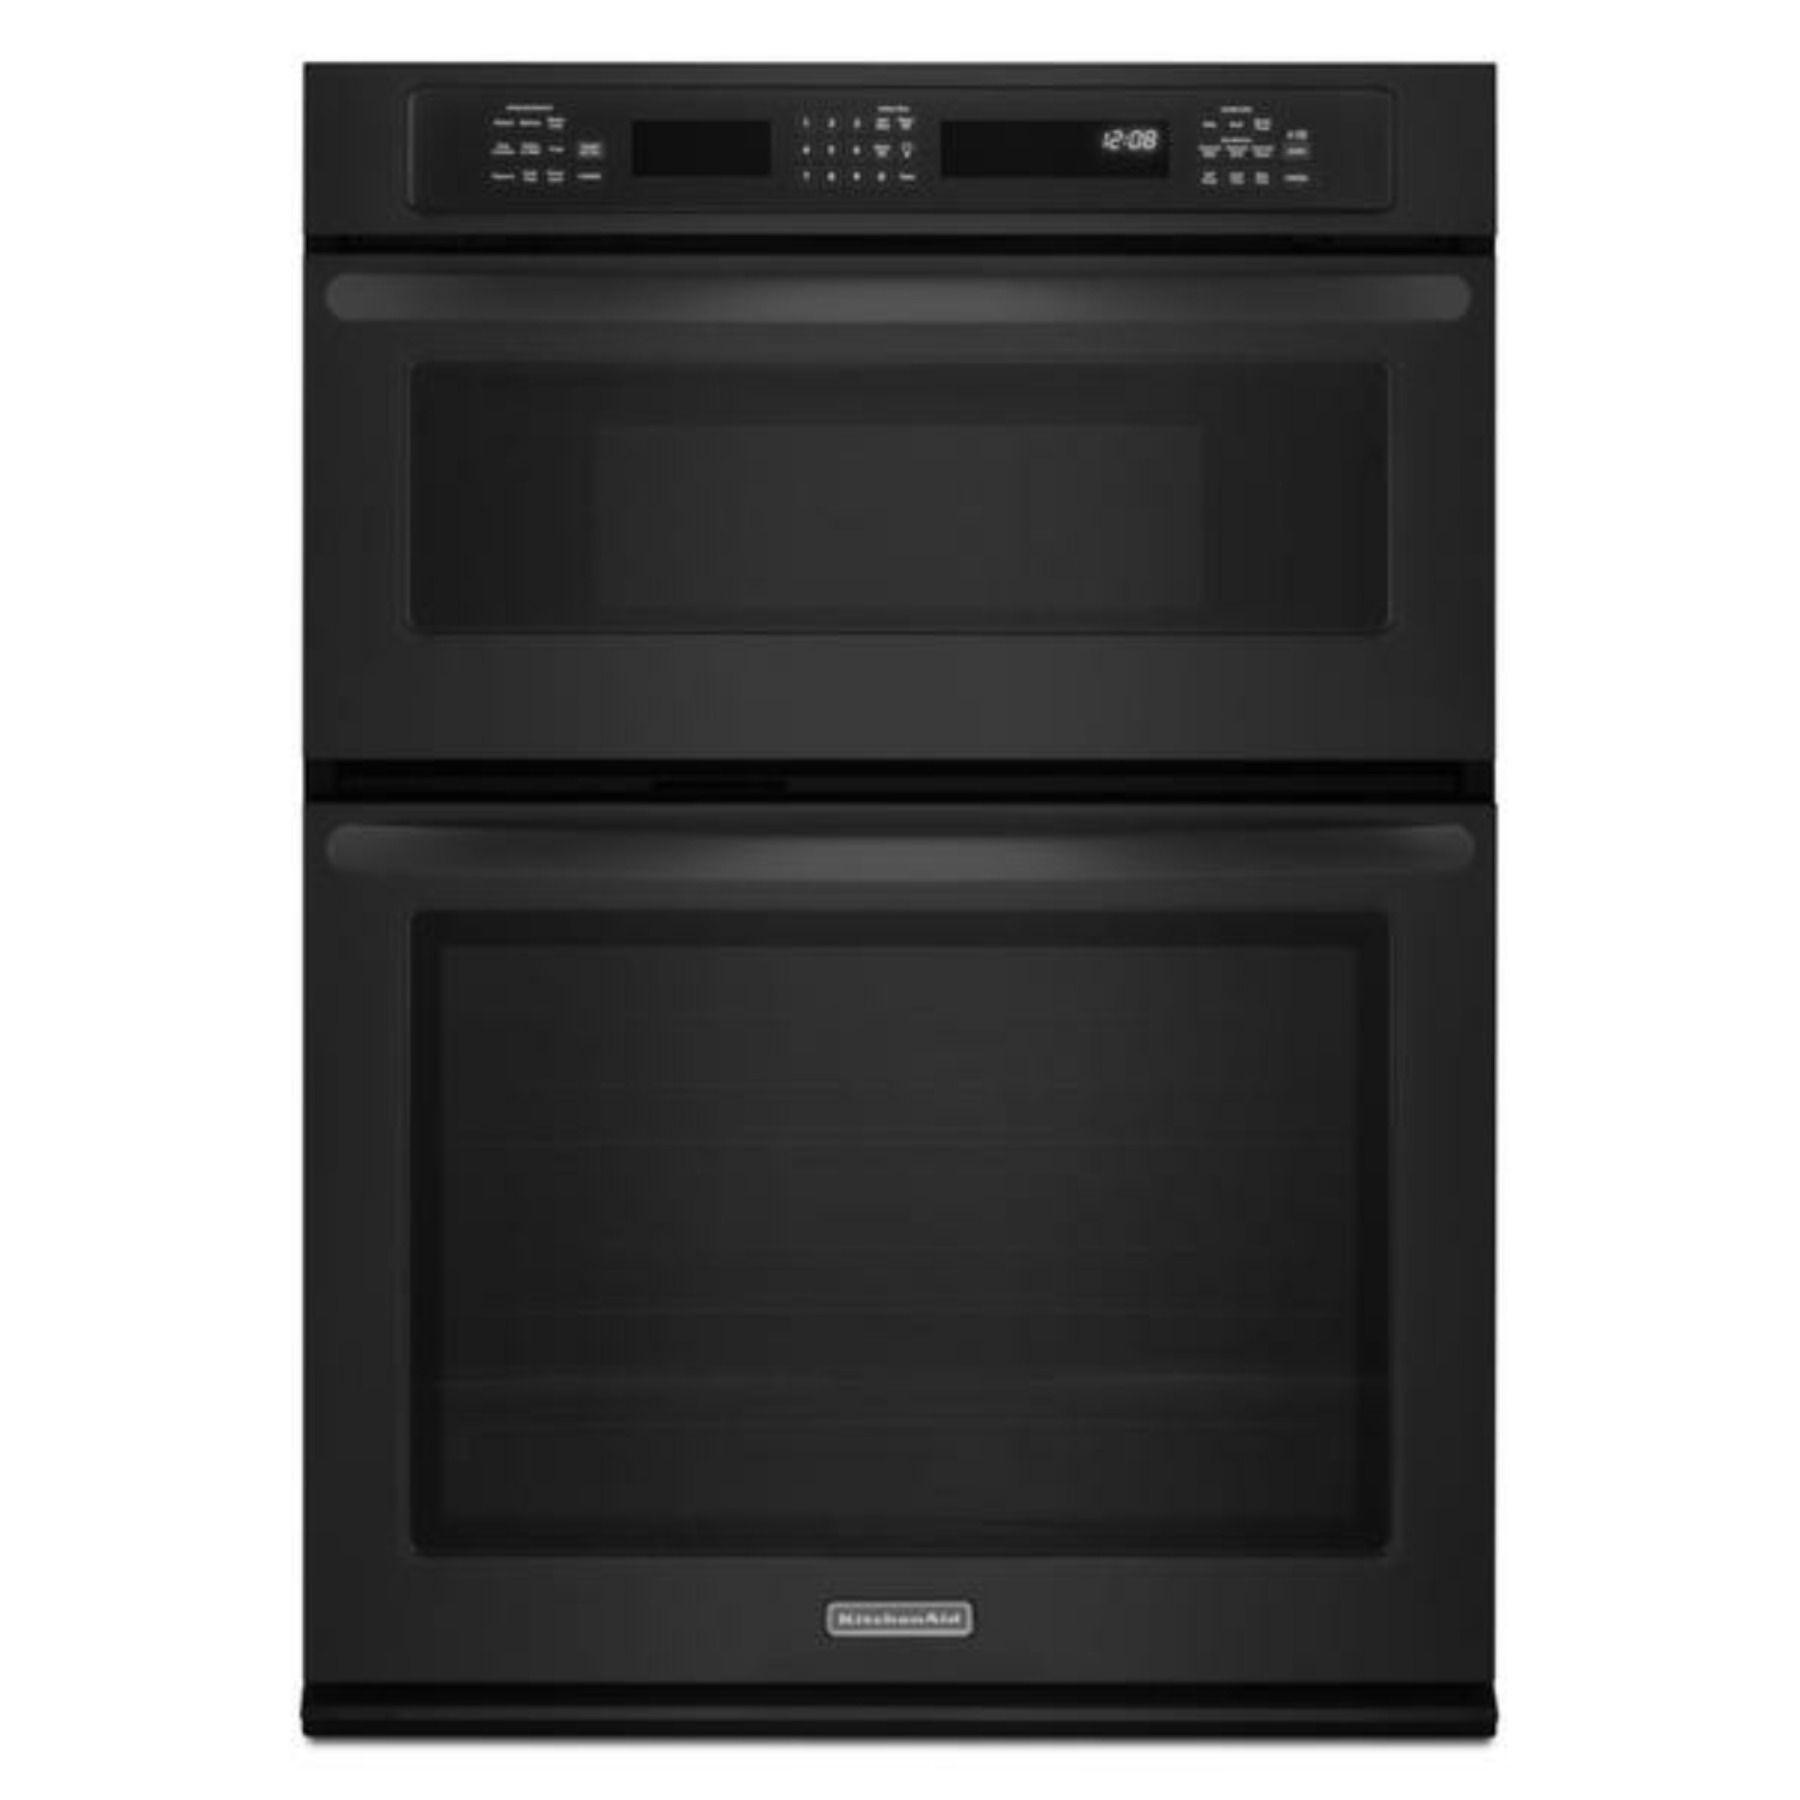 Kitchenaid architect series ii 30 black microwave wall